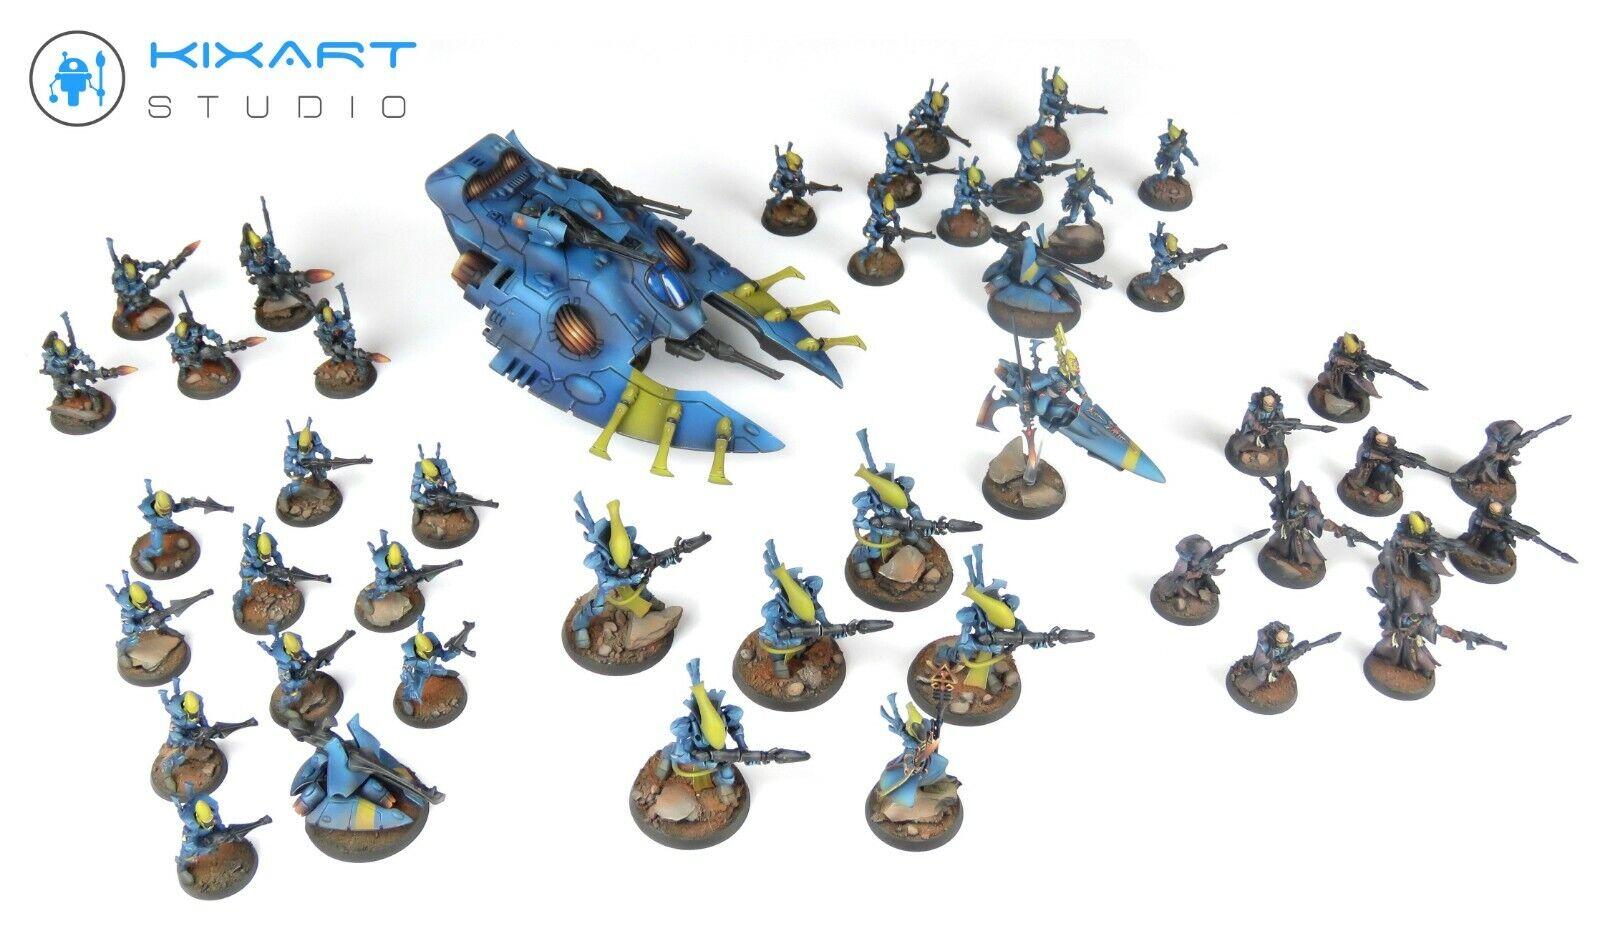 Warhammer 40,000 40k Craftworld Eldars Army - Kixart Studio - - - Pro painted ac61cb